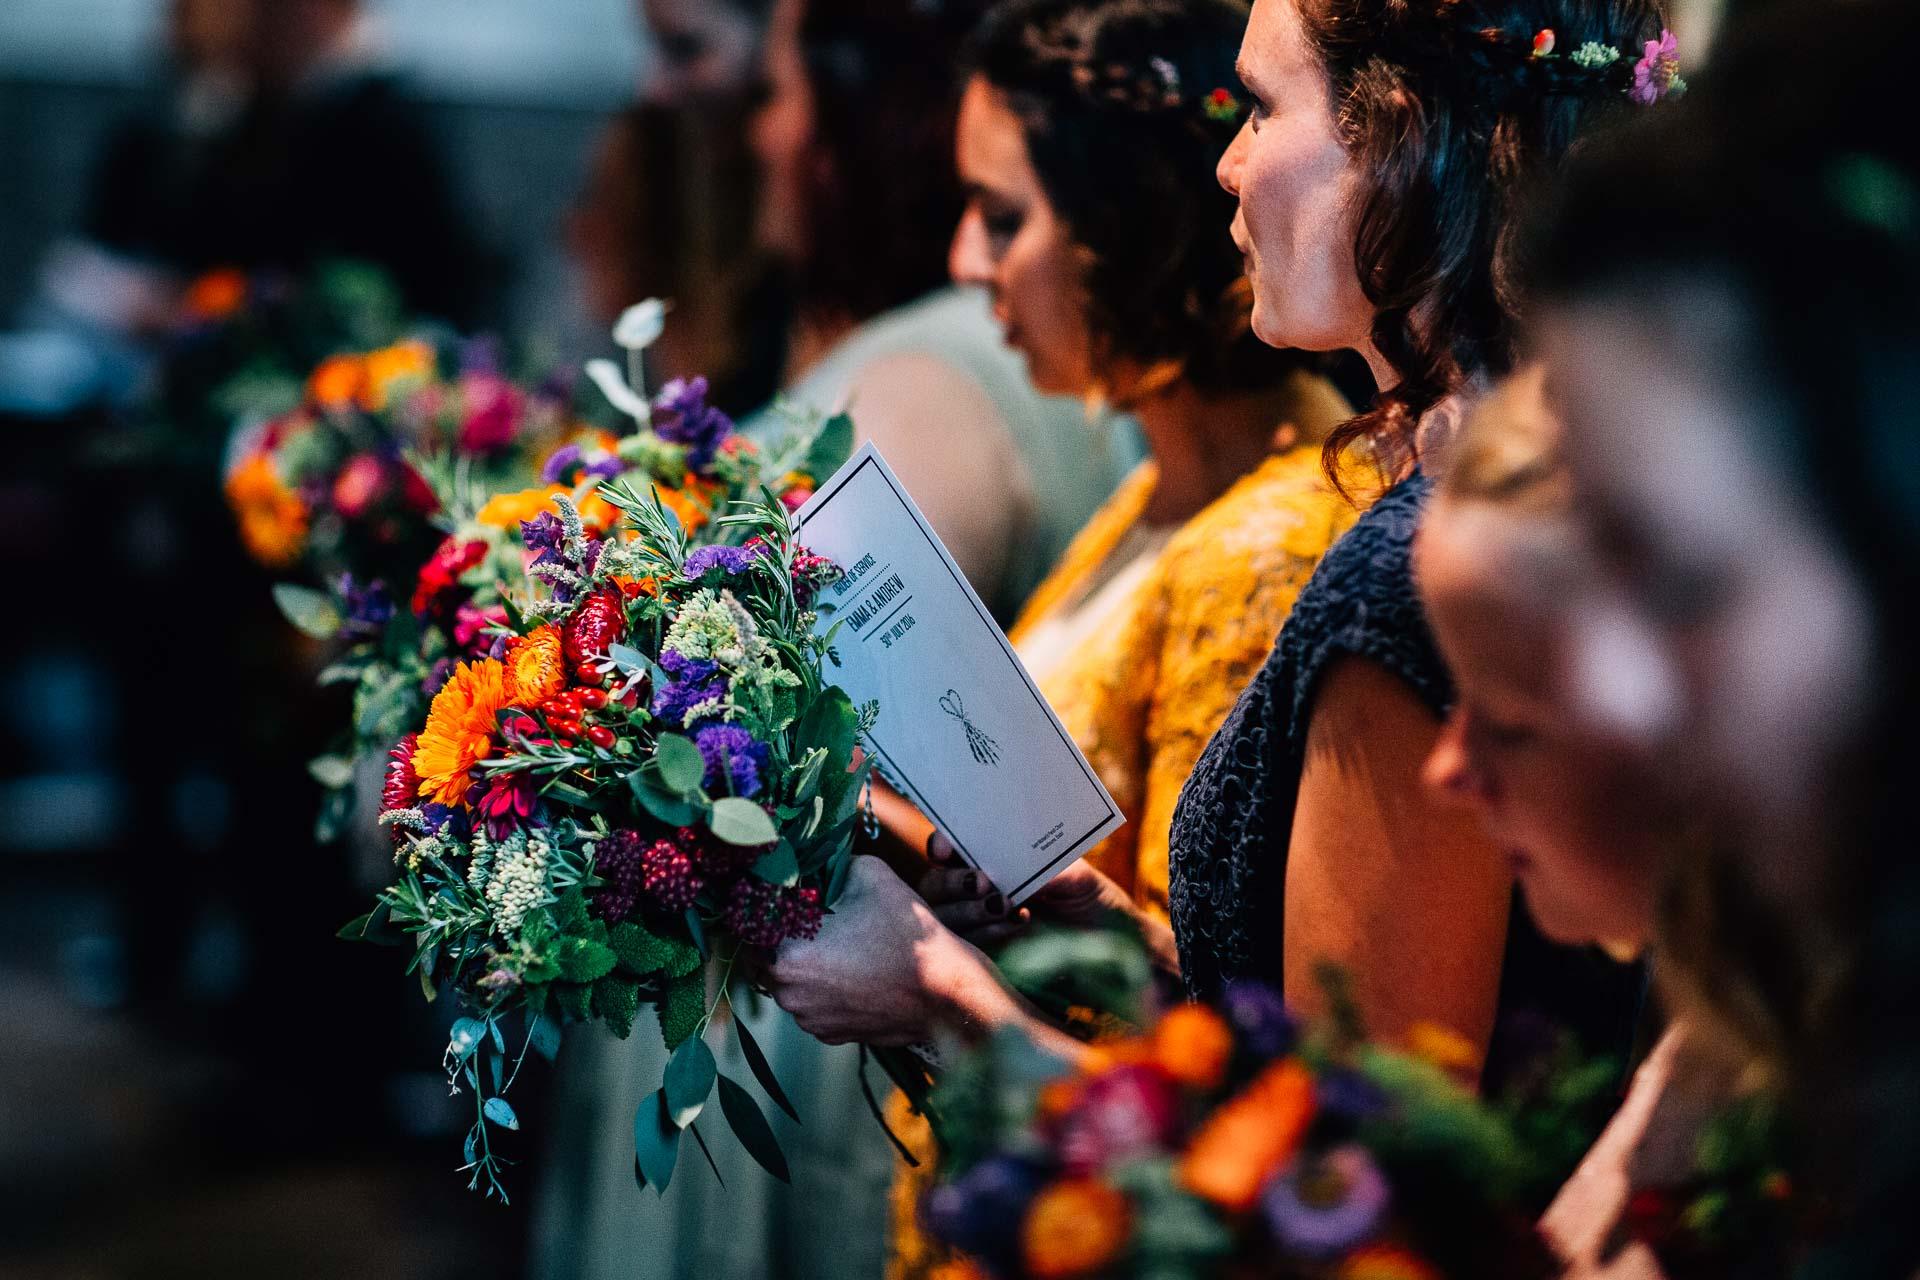 winterbourne-medieval-barn-wedding-photography-emma-andrew-55